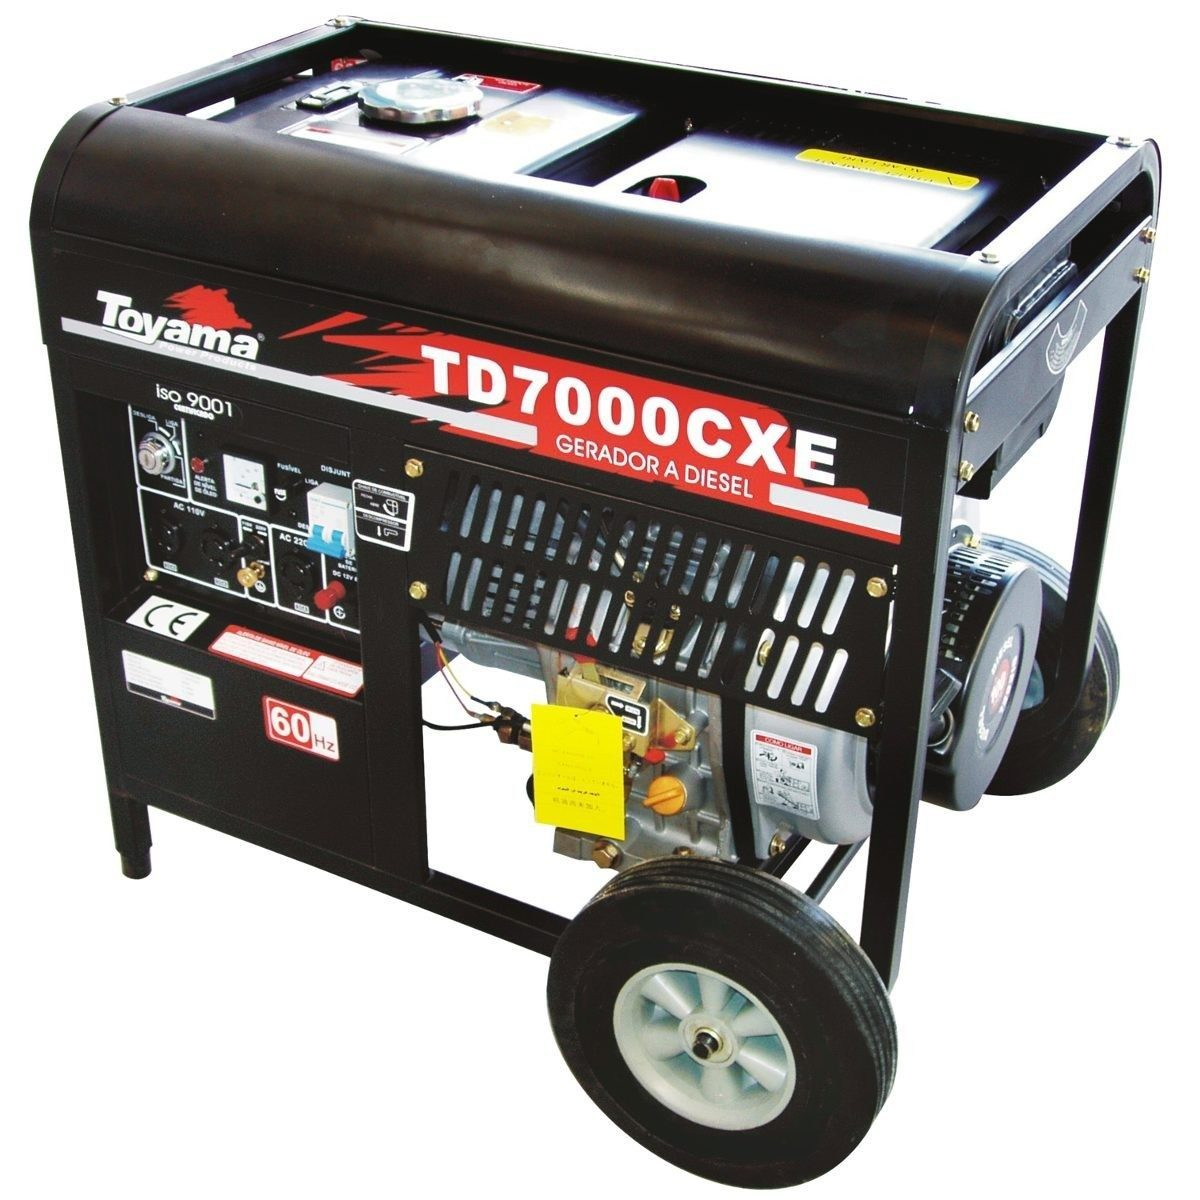 e4a92fae112 Força Grupo Gerador Energia Diesel Toyama Td7000cxe 6